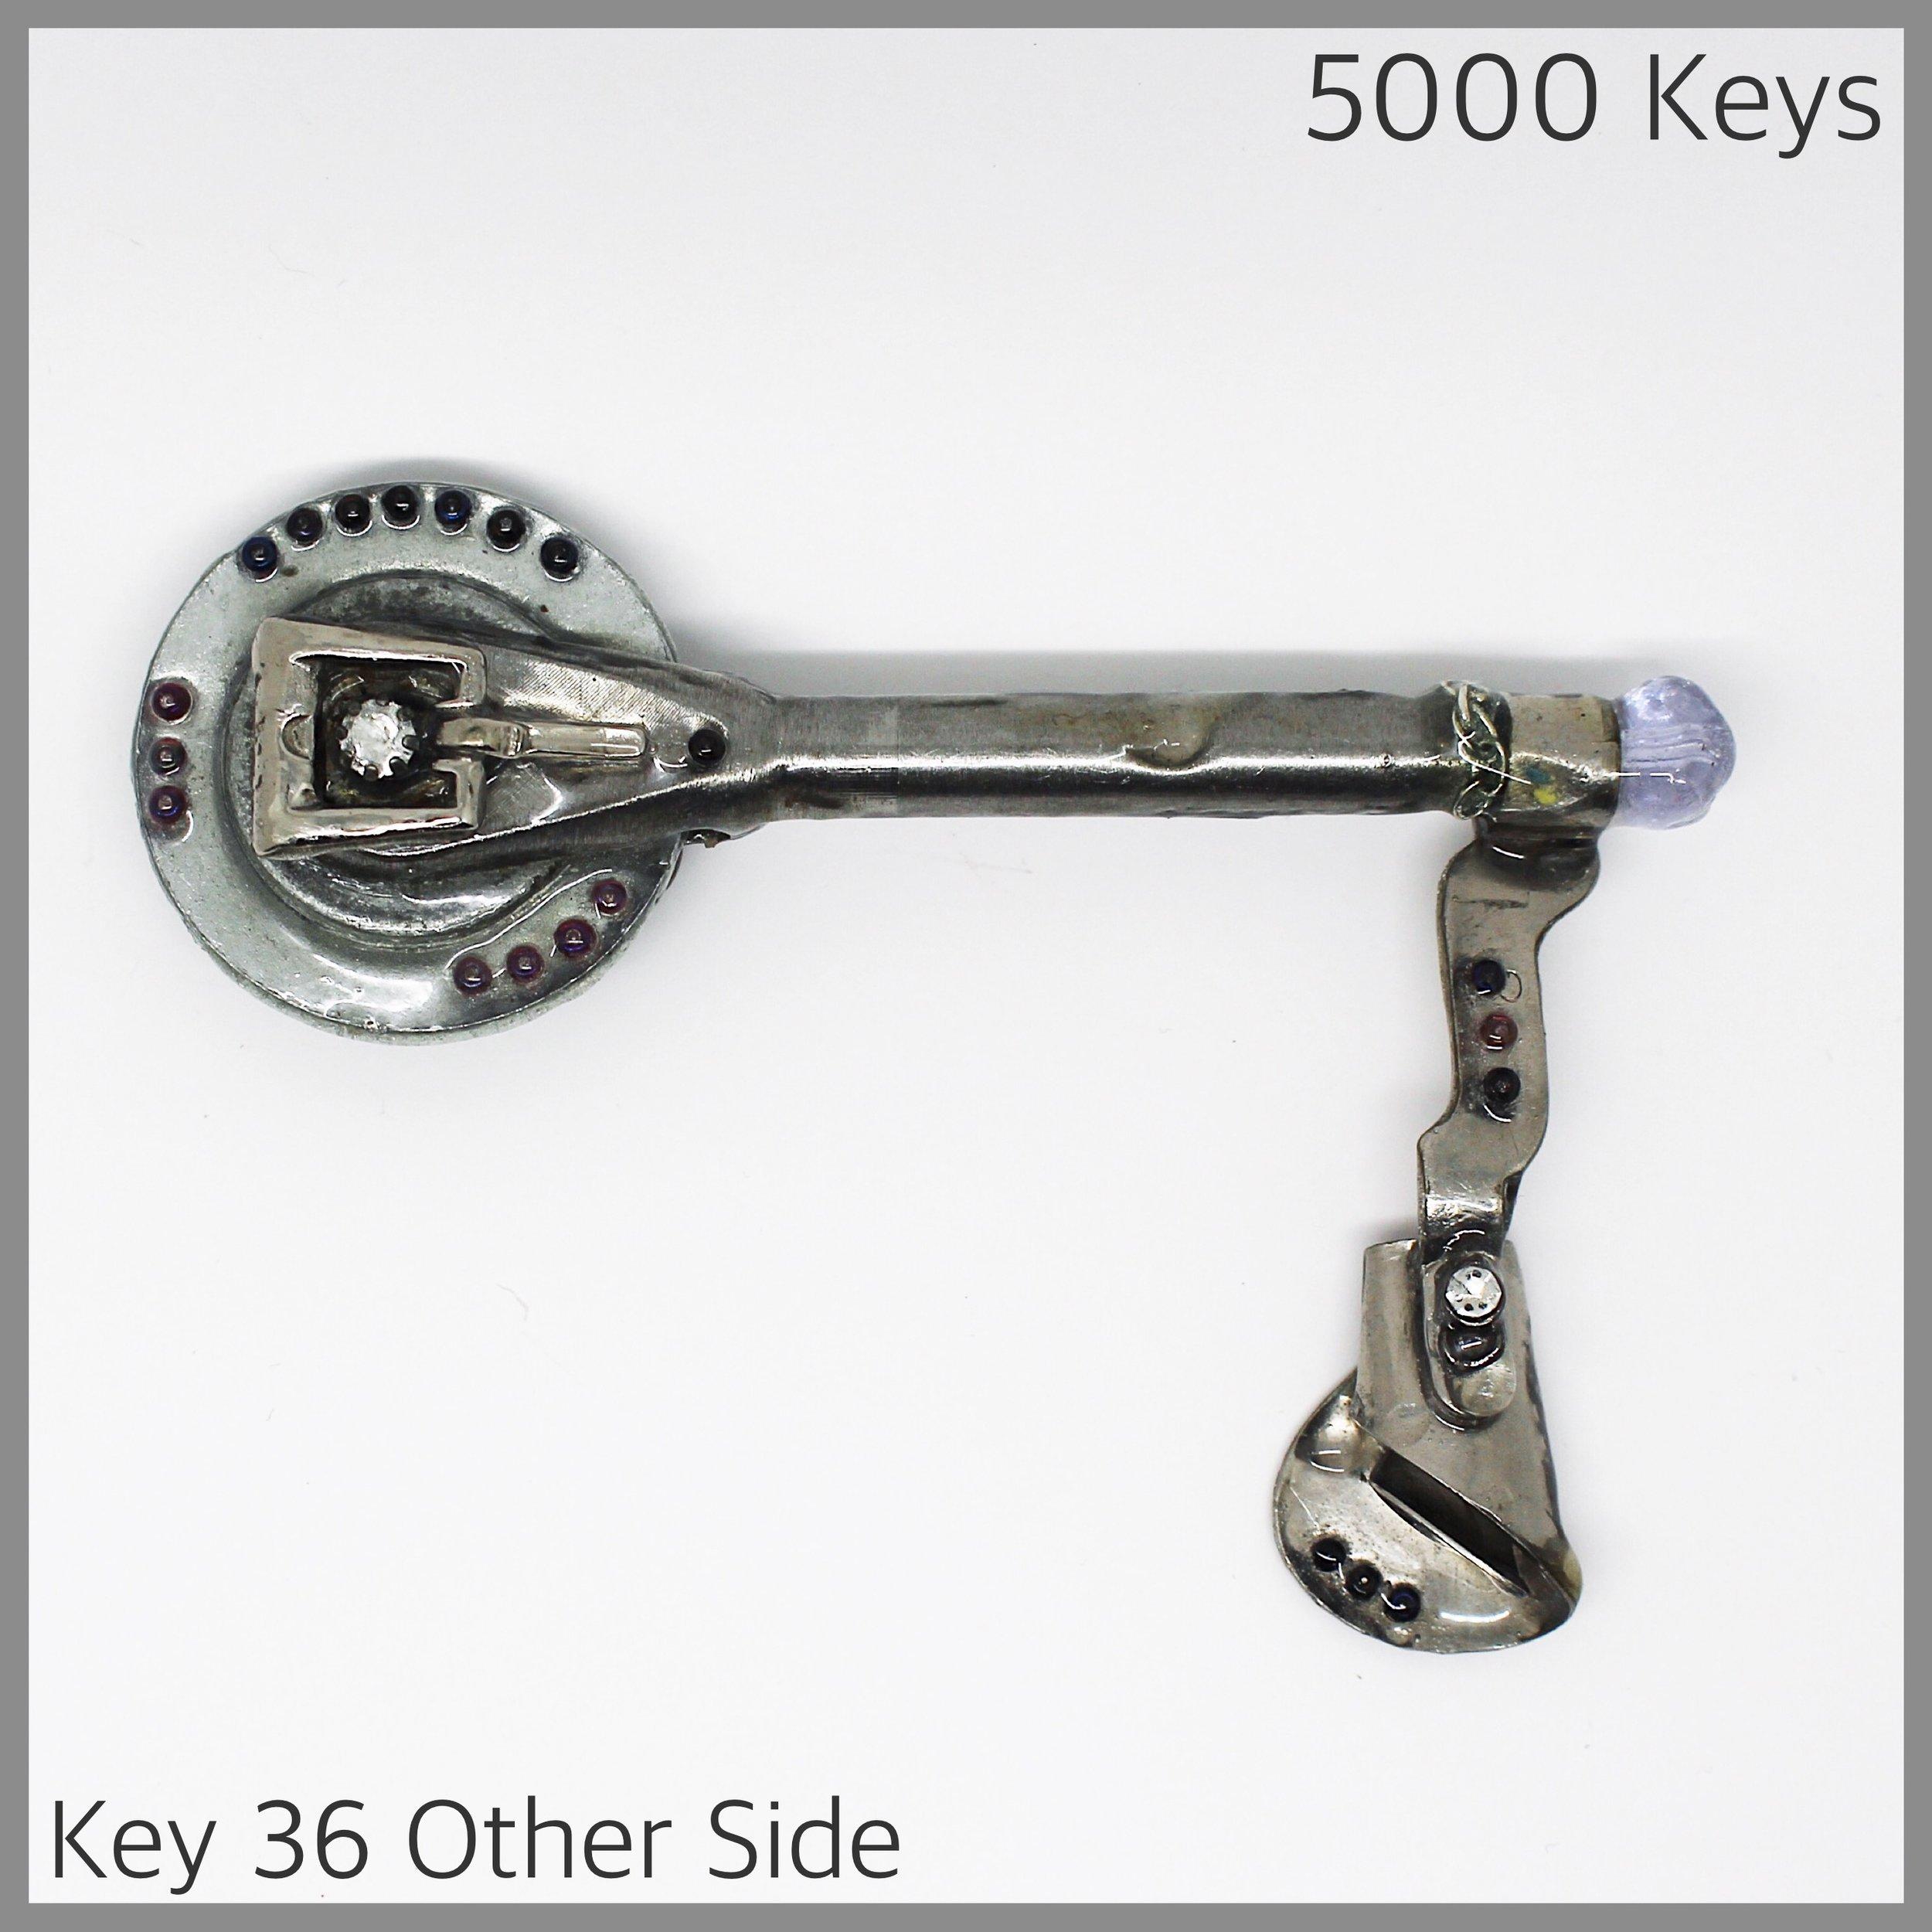 Key 36 other side - 1.JPG